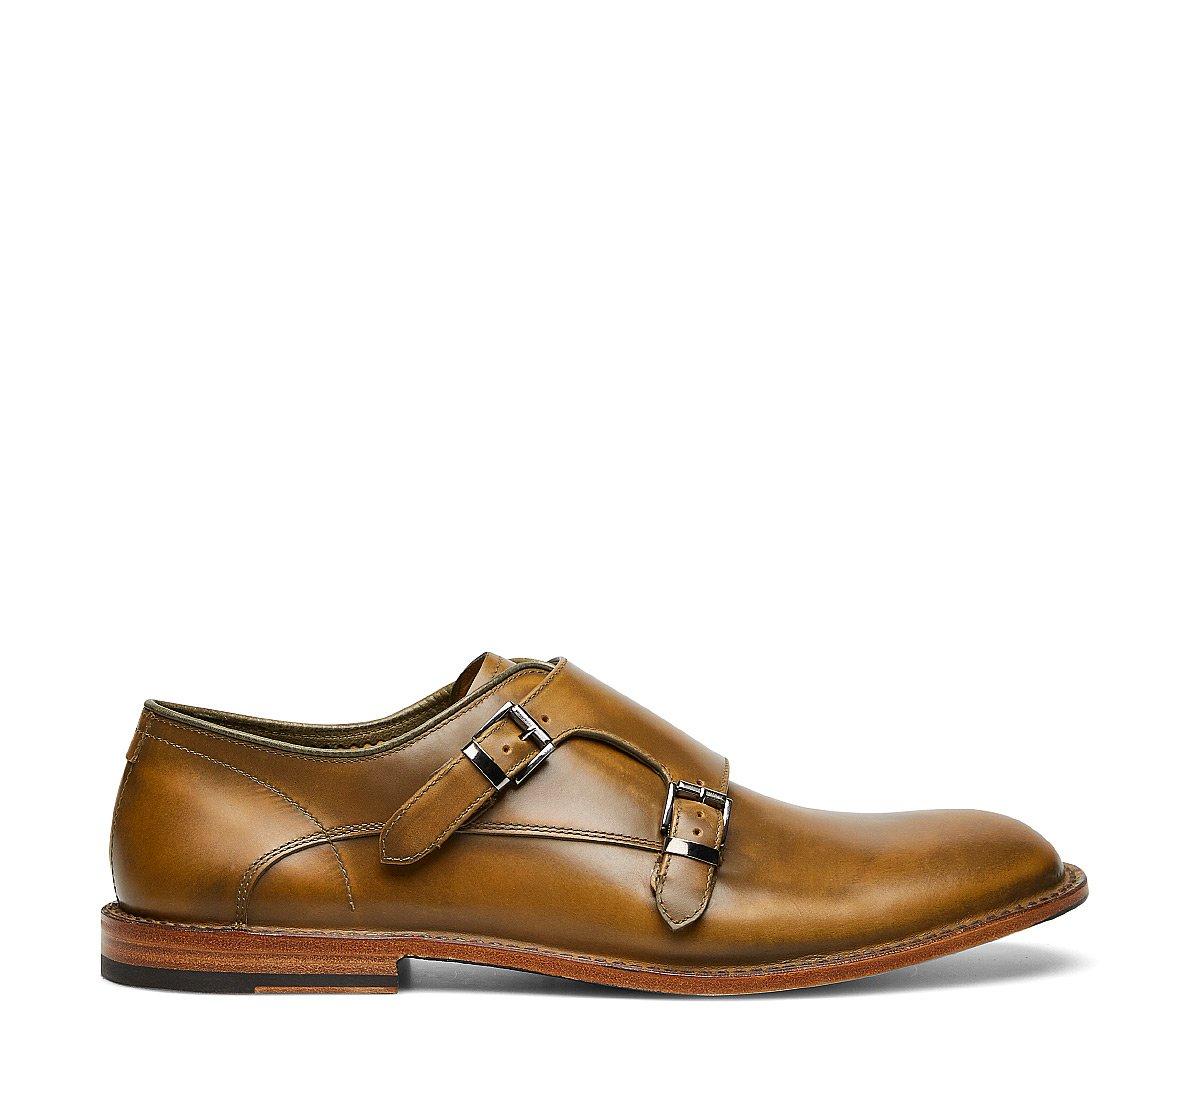 Barracuda Double monk strap calfskin shoes